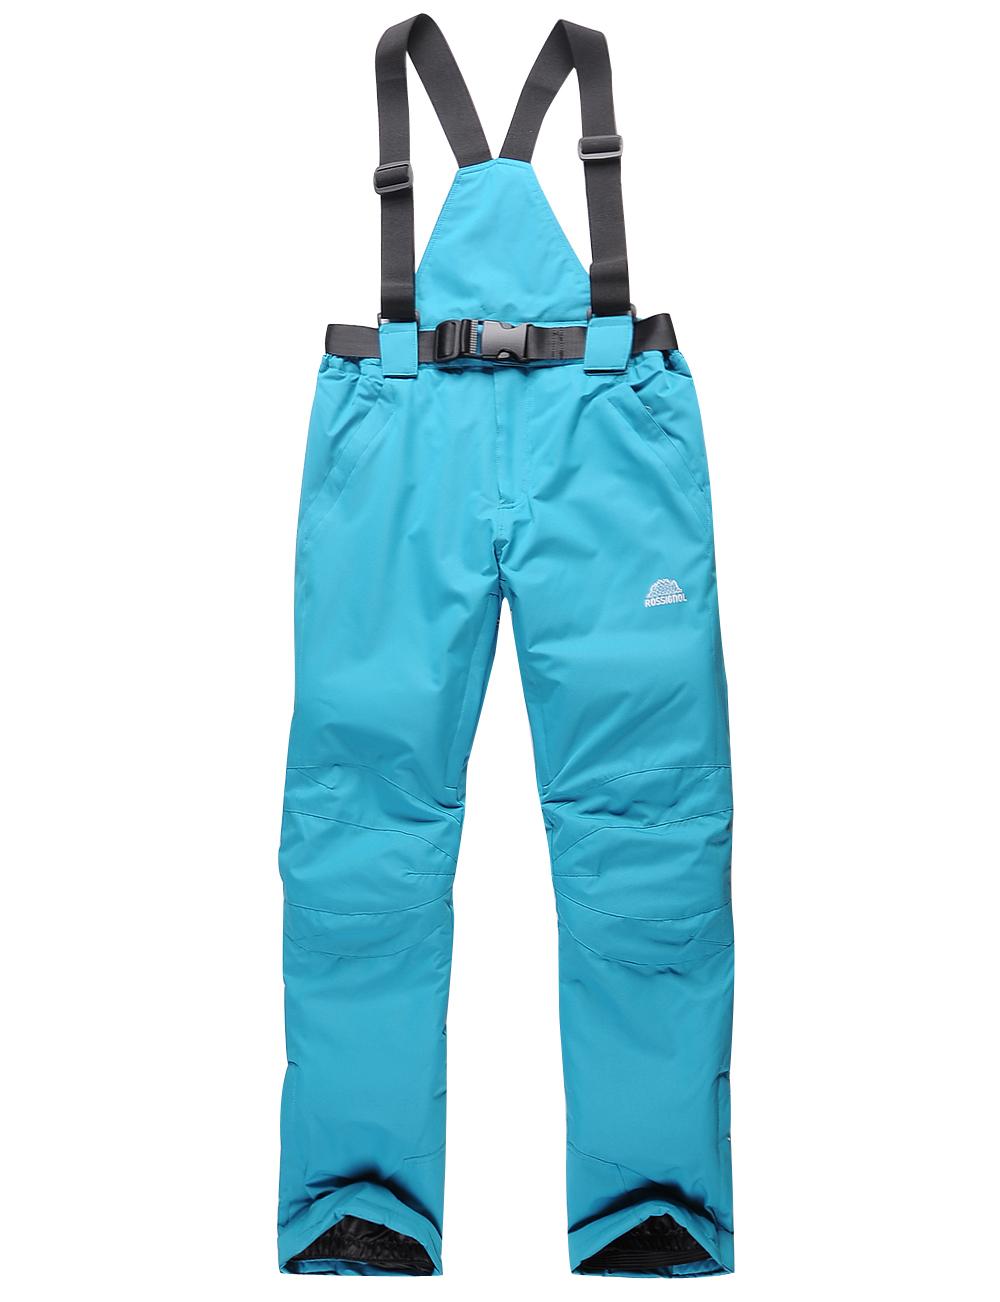 Windproof waterproof Outdoor Men Women Genuine Warmth Strap Ski Snowboard Pants 5 Color Size XS-XXL - sports 1135 club store